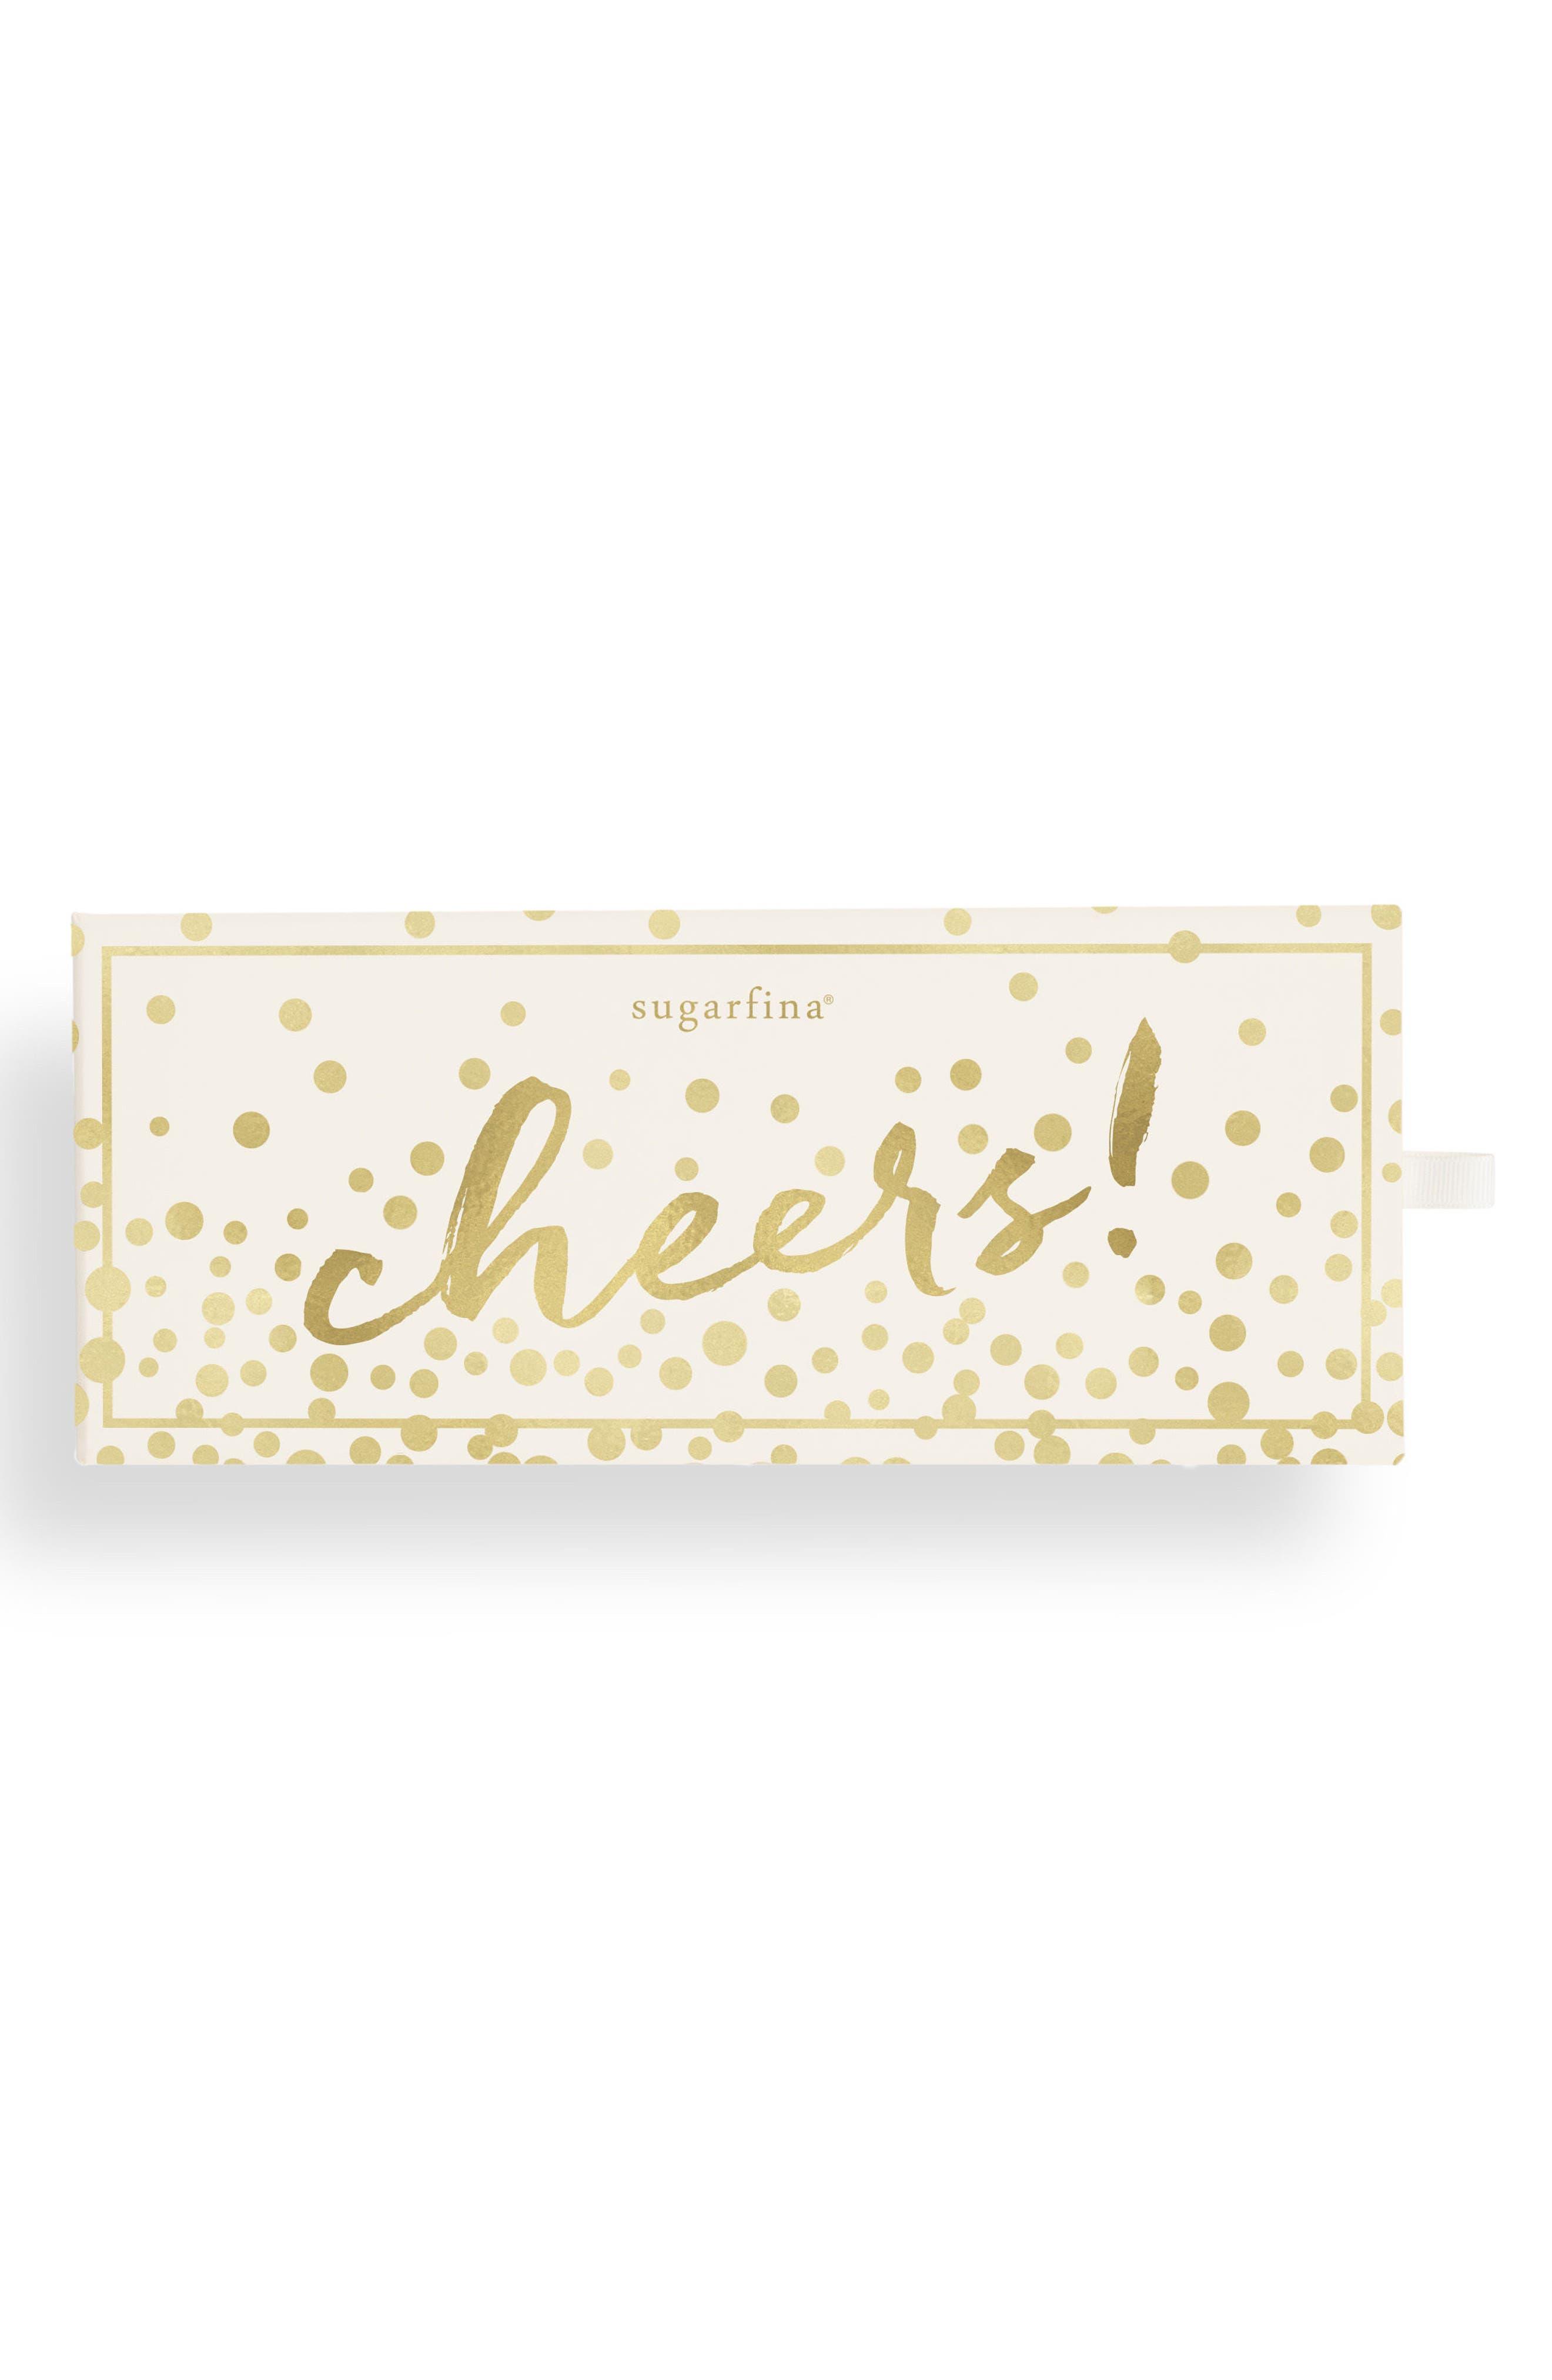 Main Image - sugarfina Cheers 3-Piece Candy Bento Box